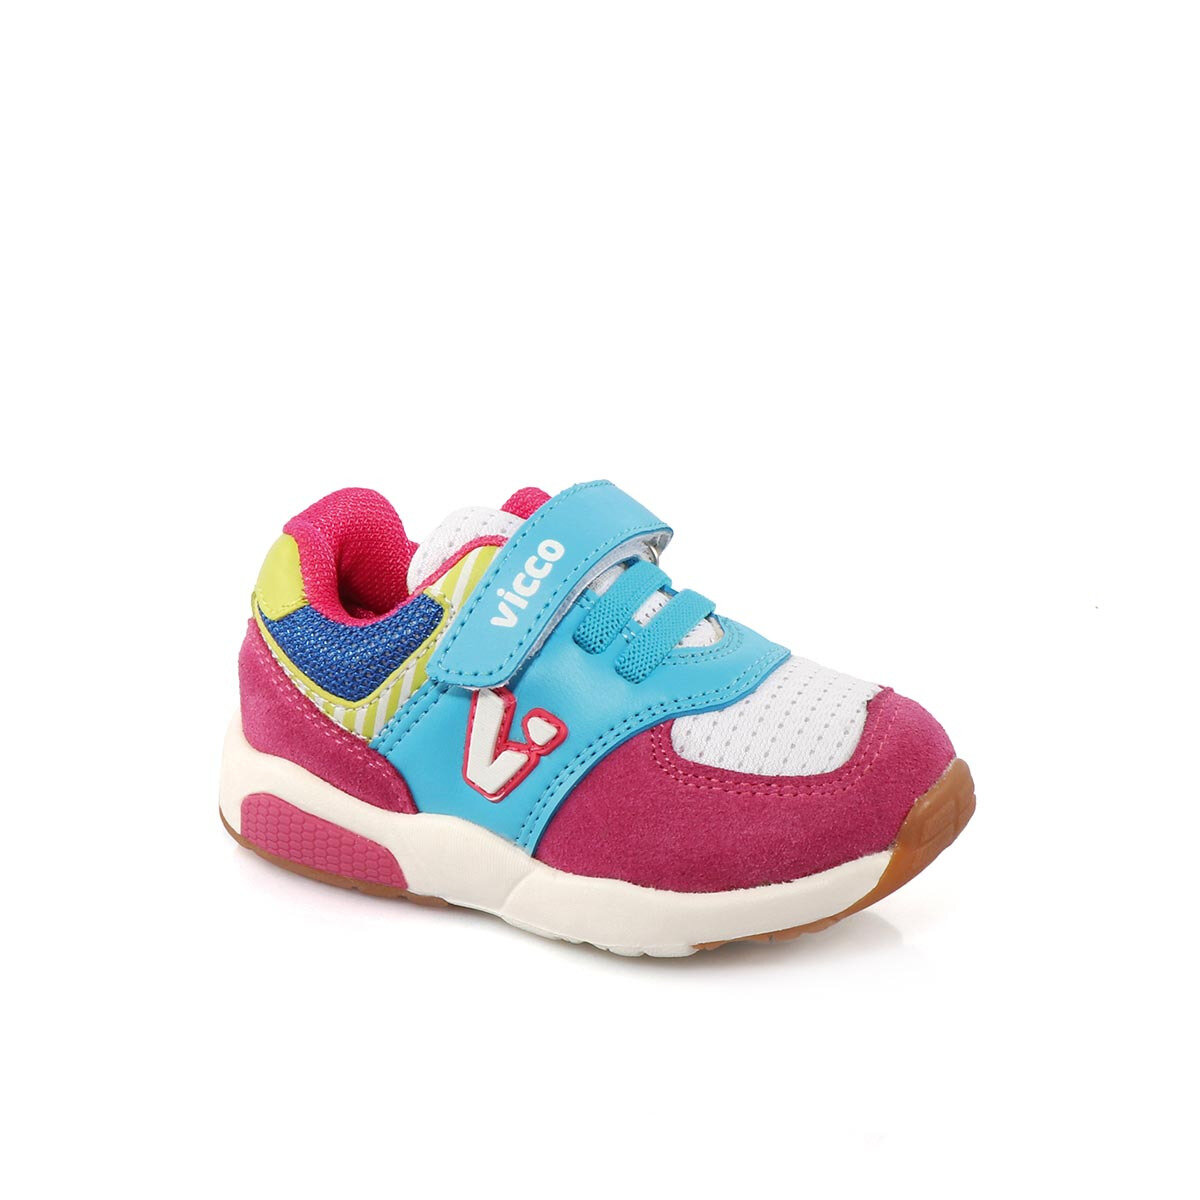 FLO 346.18Y.151 BEBE SPORT White Female Child Sneaker Shoes VICCO